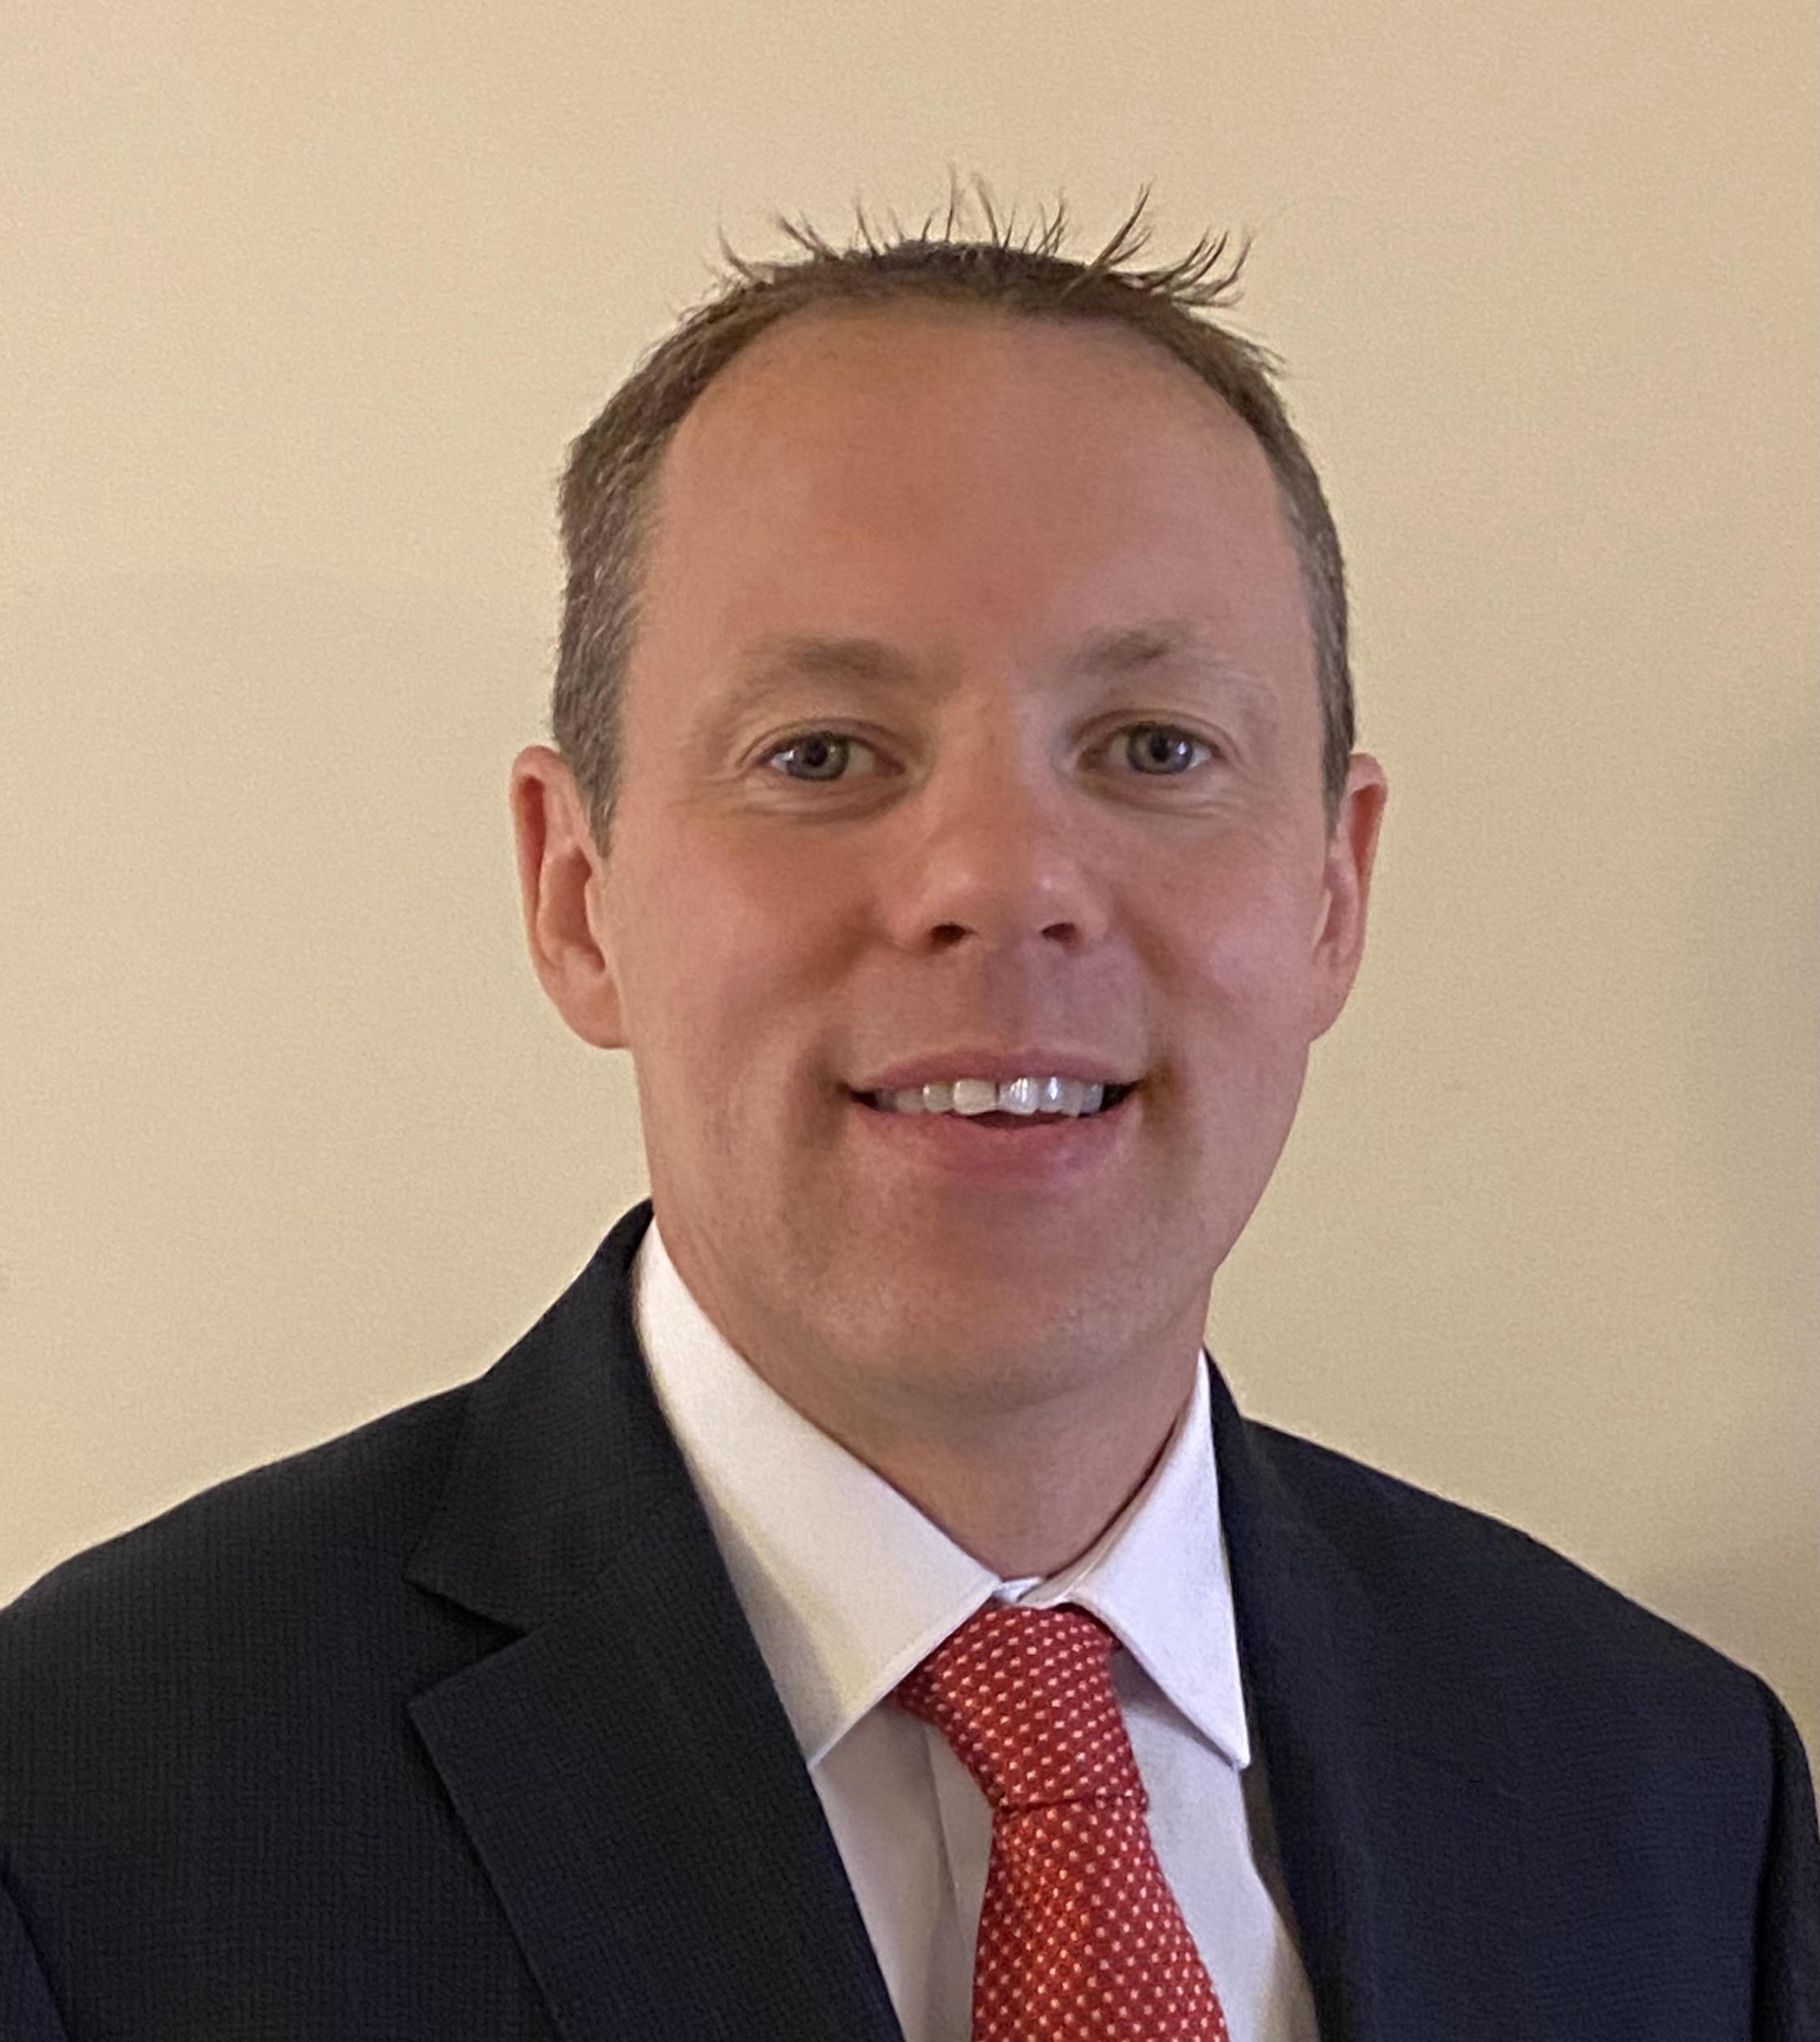 Luke Thomas joins Business Partnership